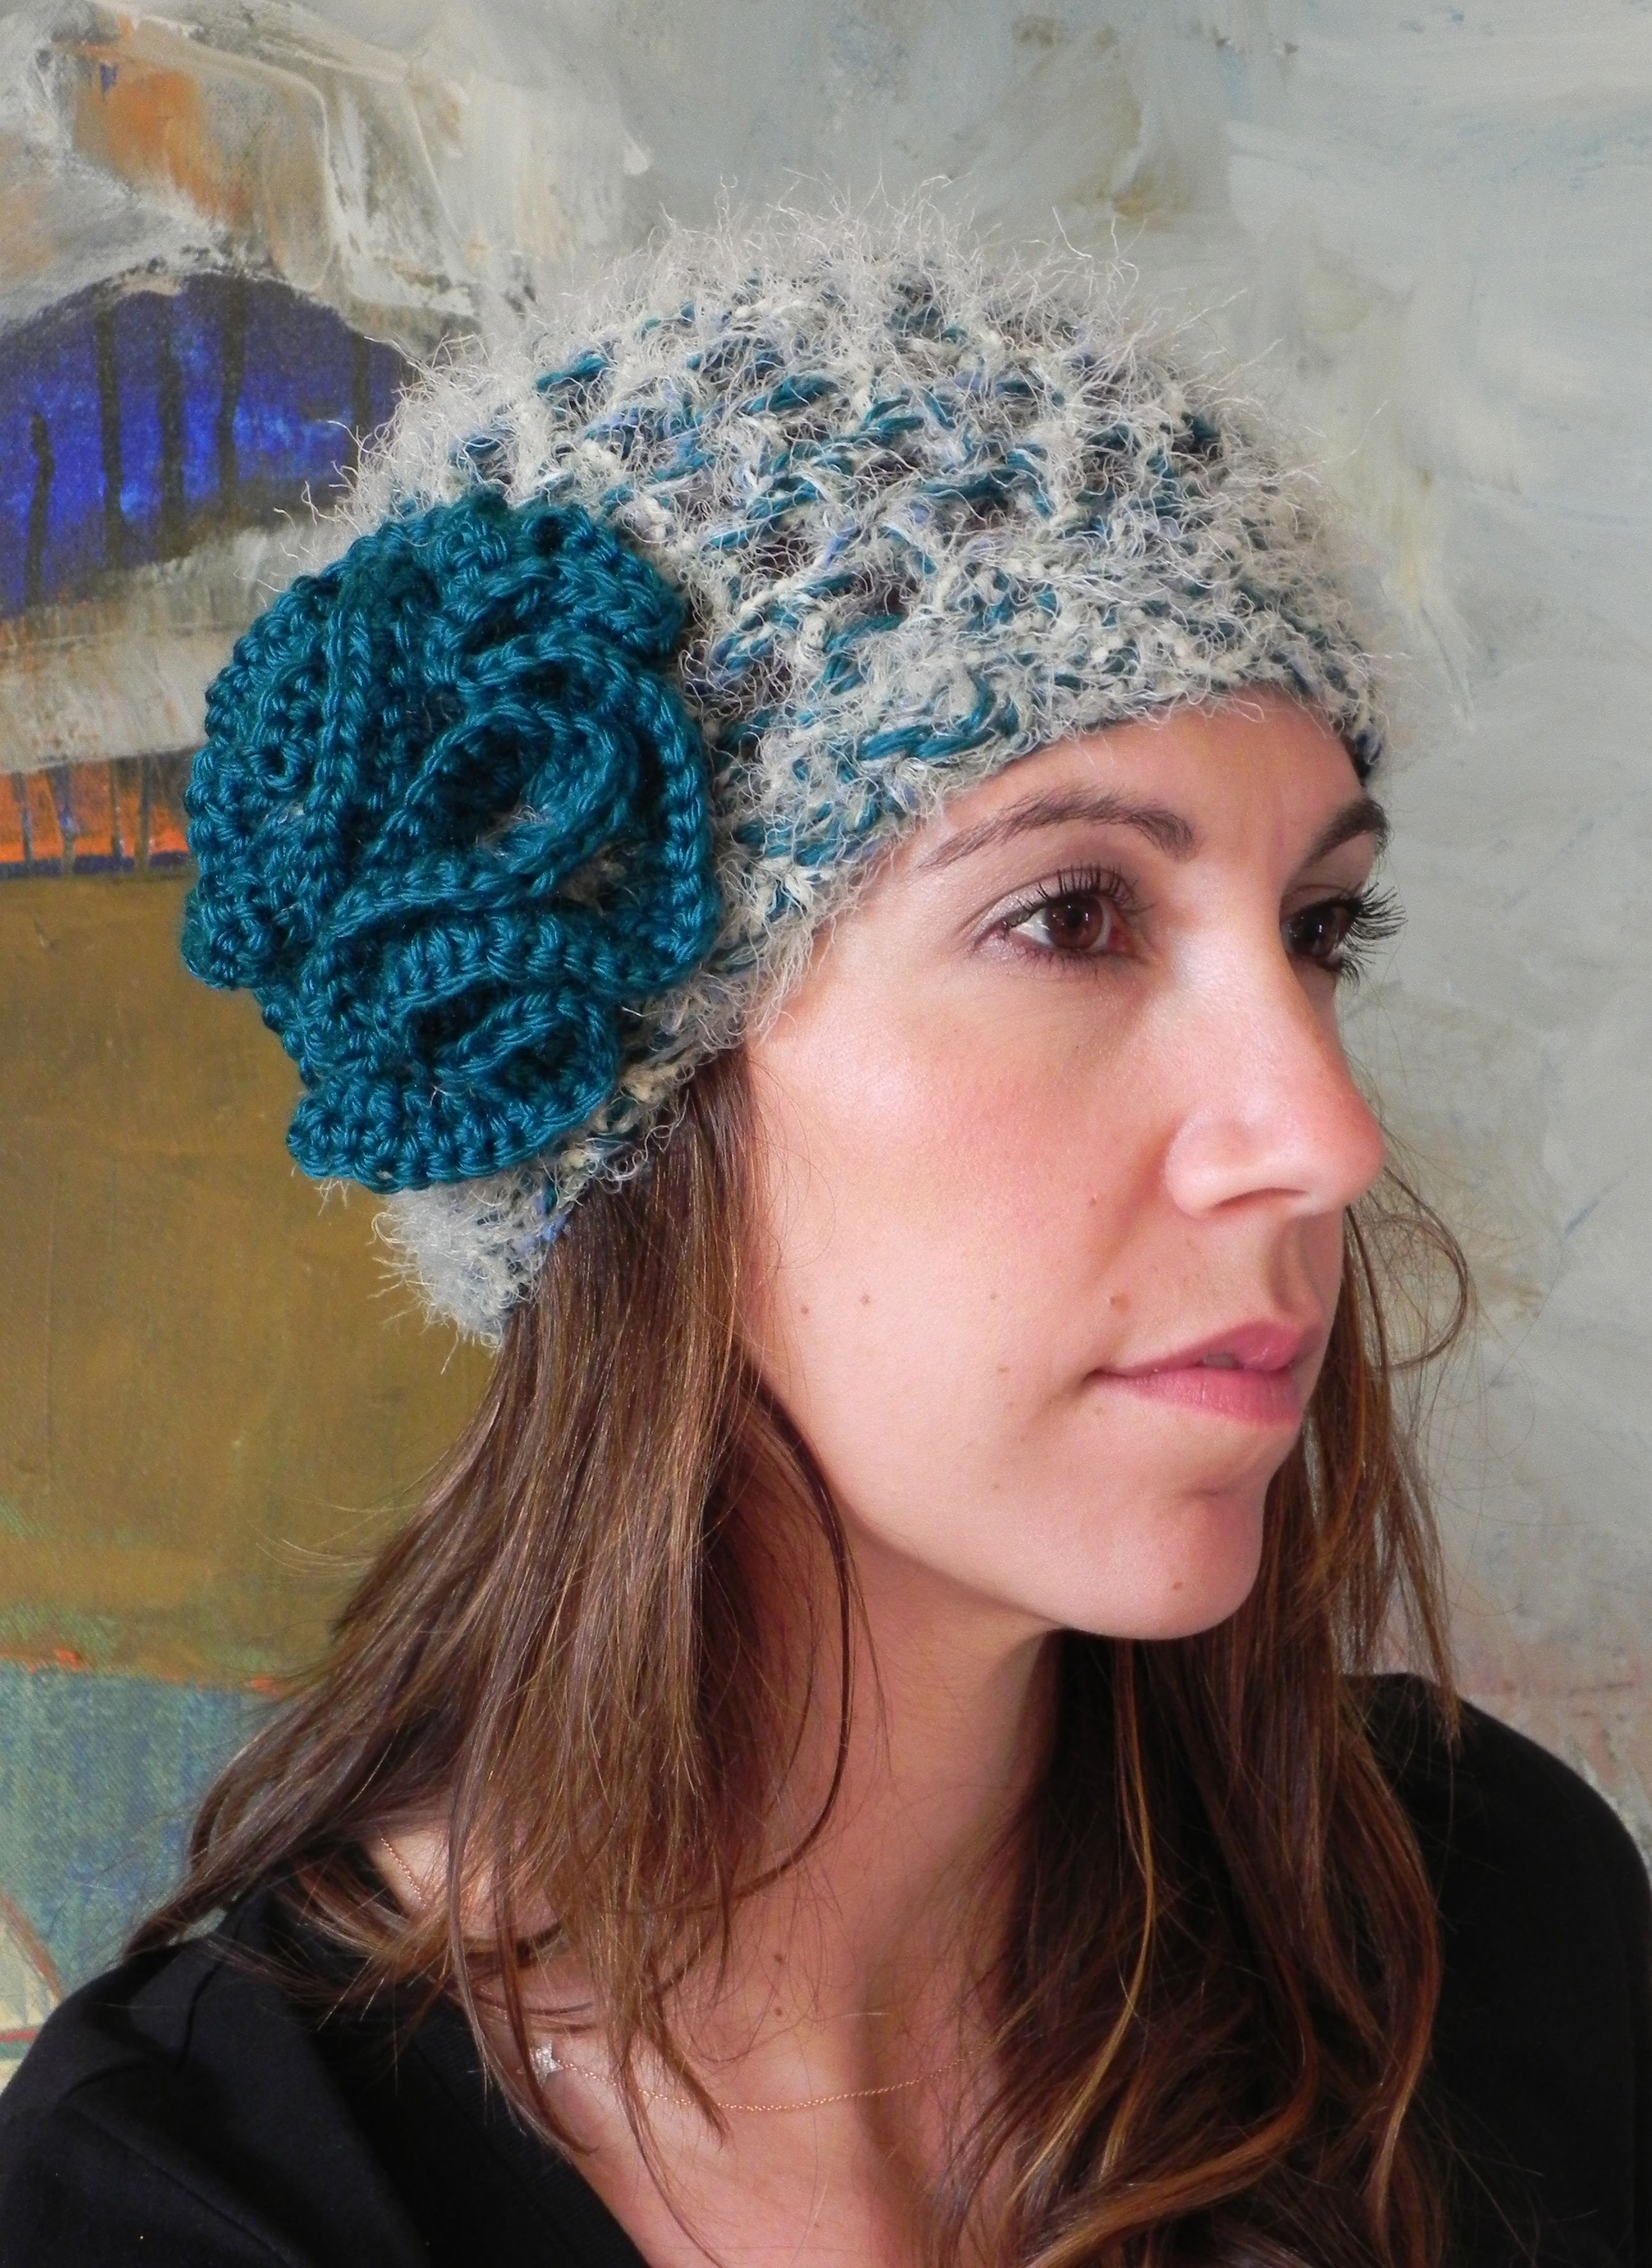 """Hats with Attitude"" by Nancy Bossert"